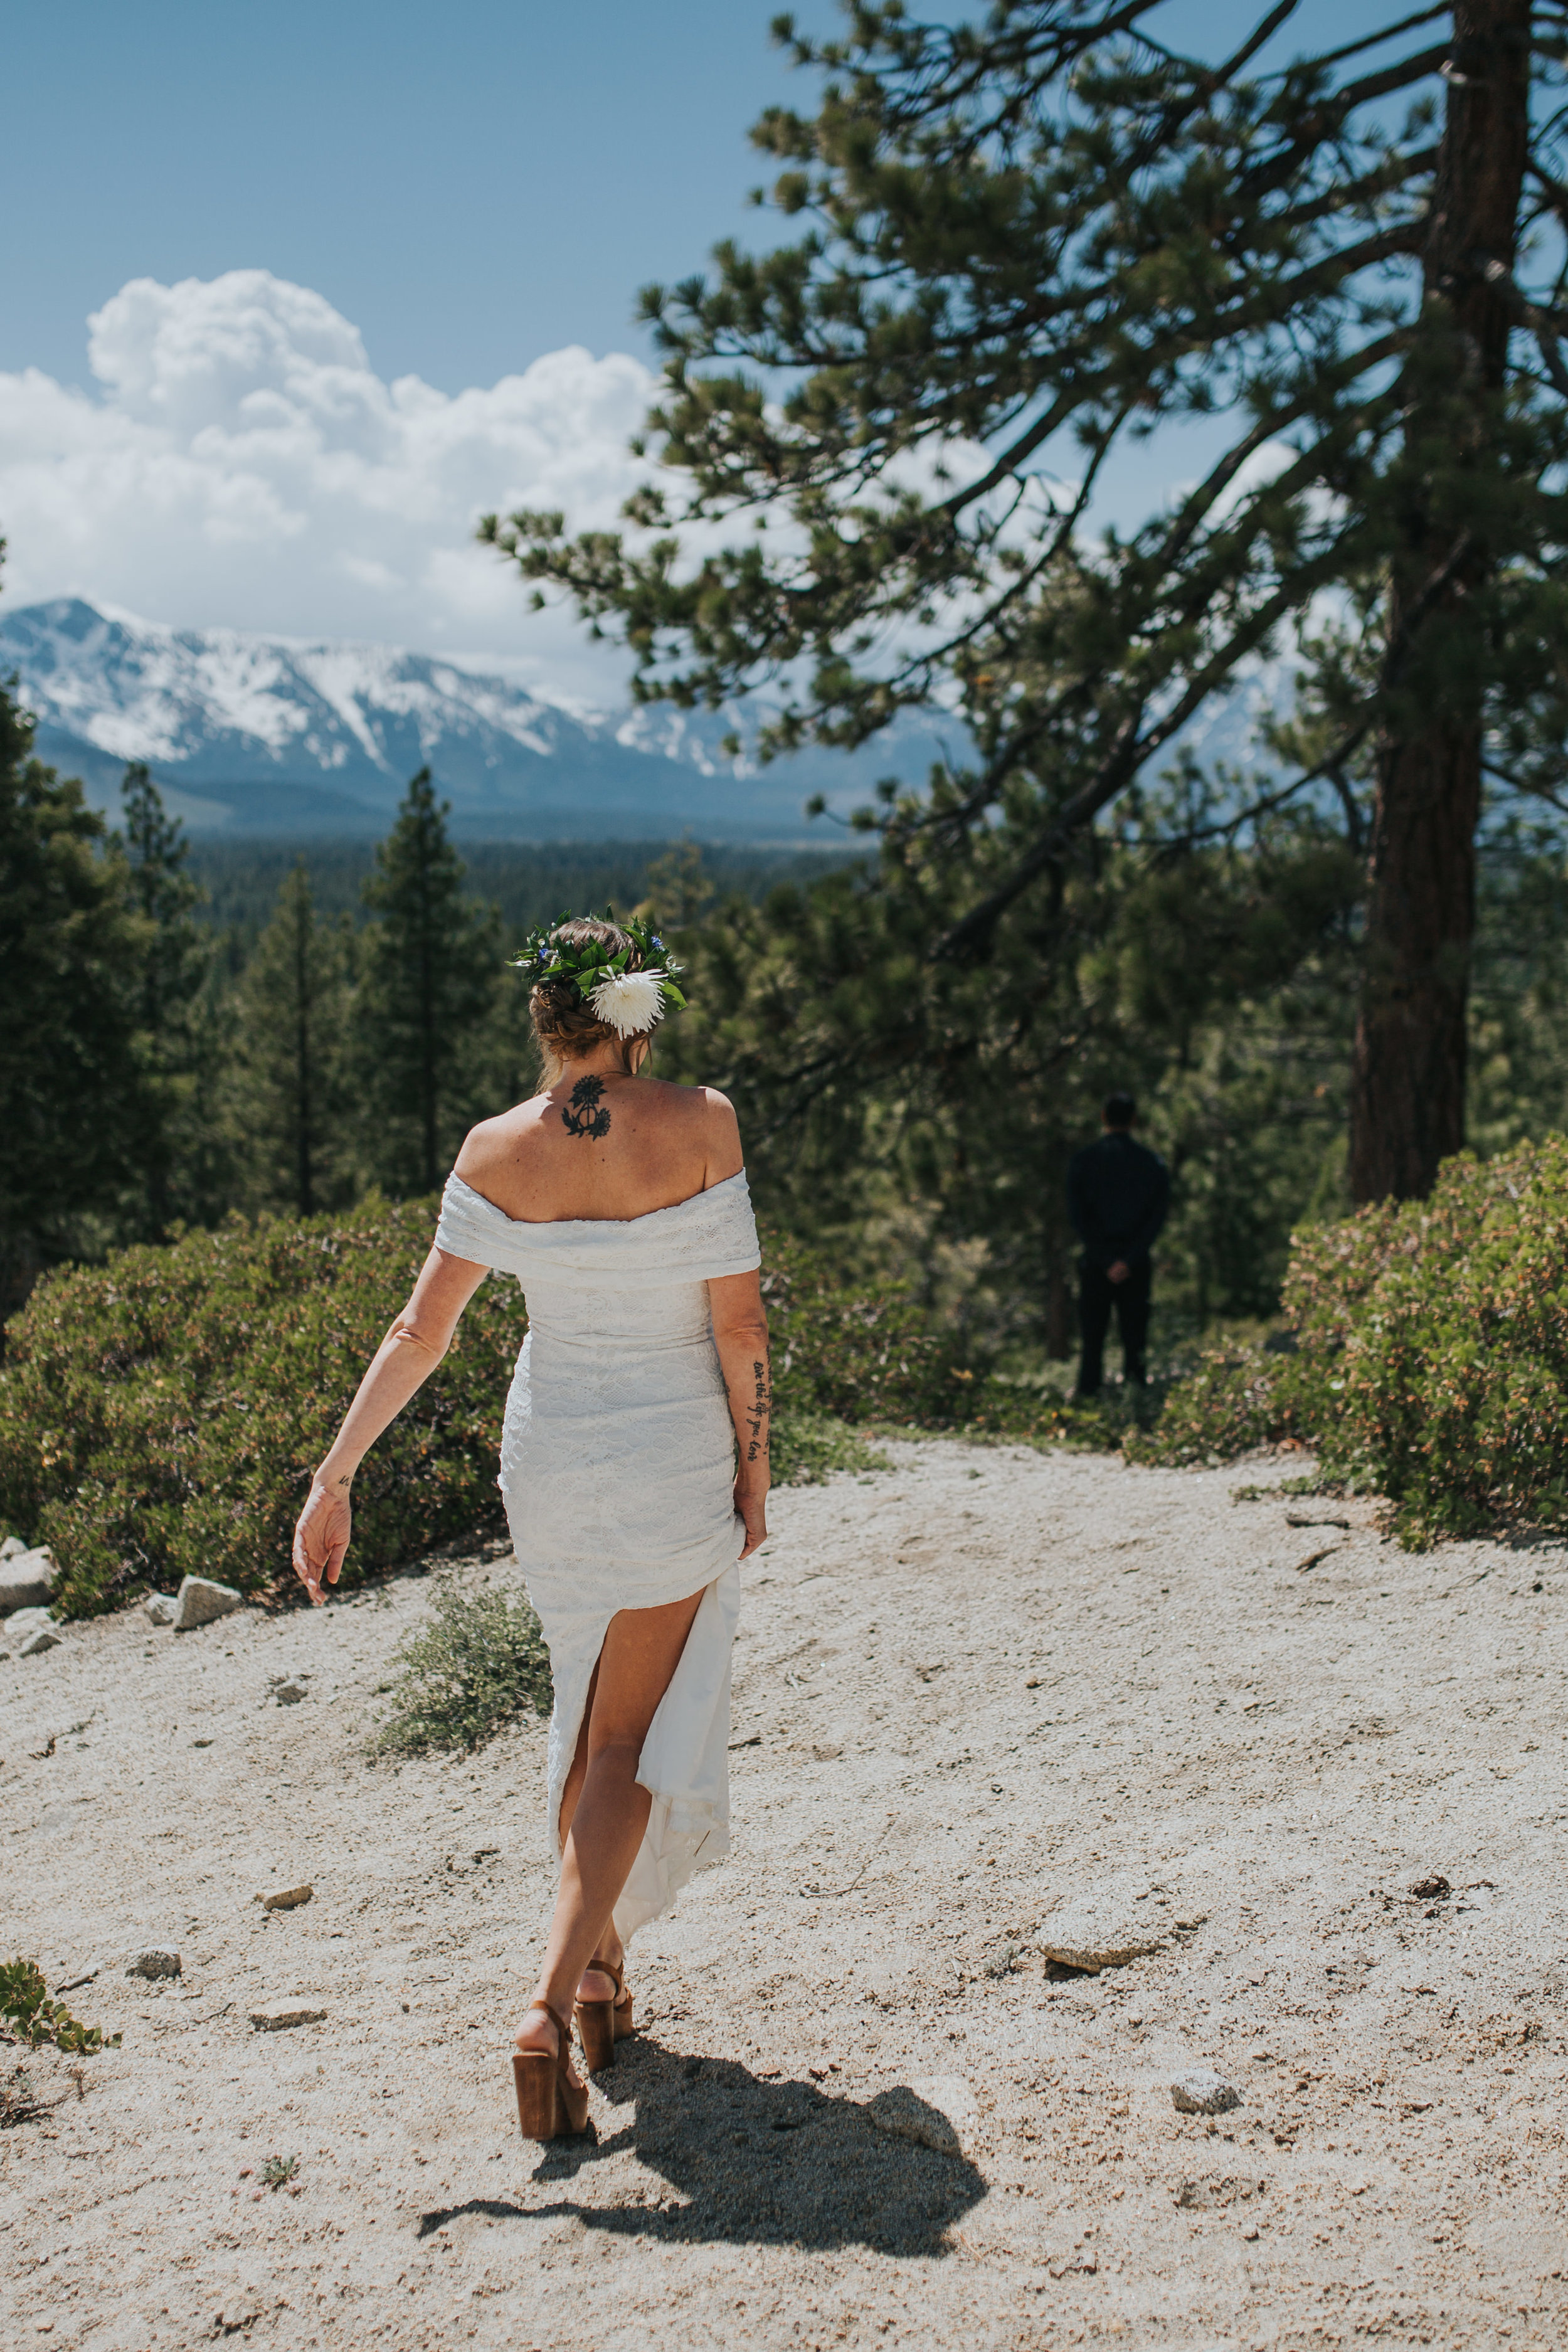 south-lake-tahoe-elopement-valerie-lendvay-photo-001.jpg